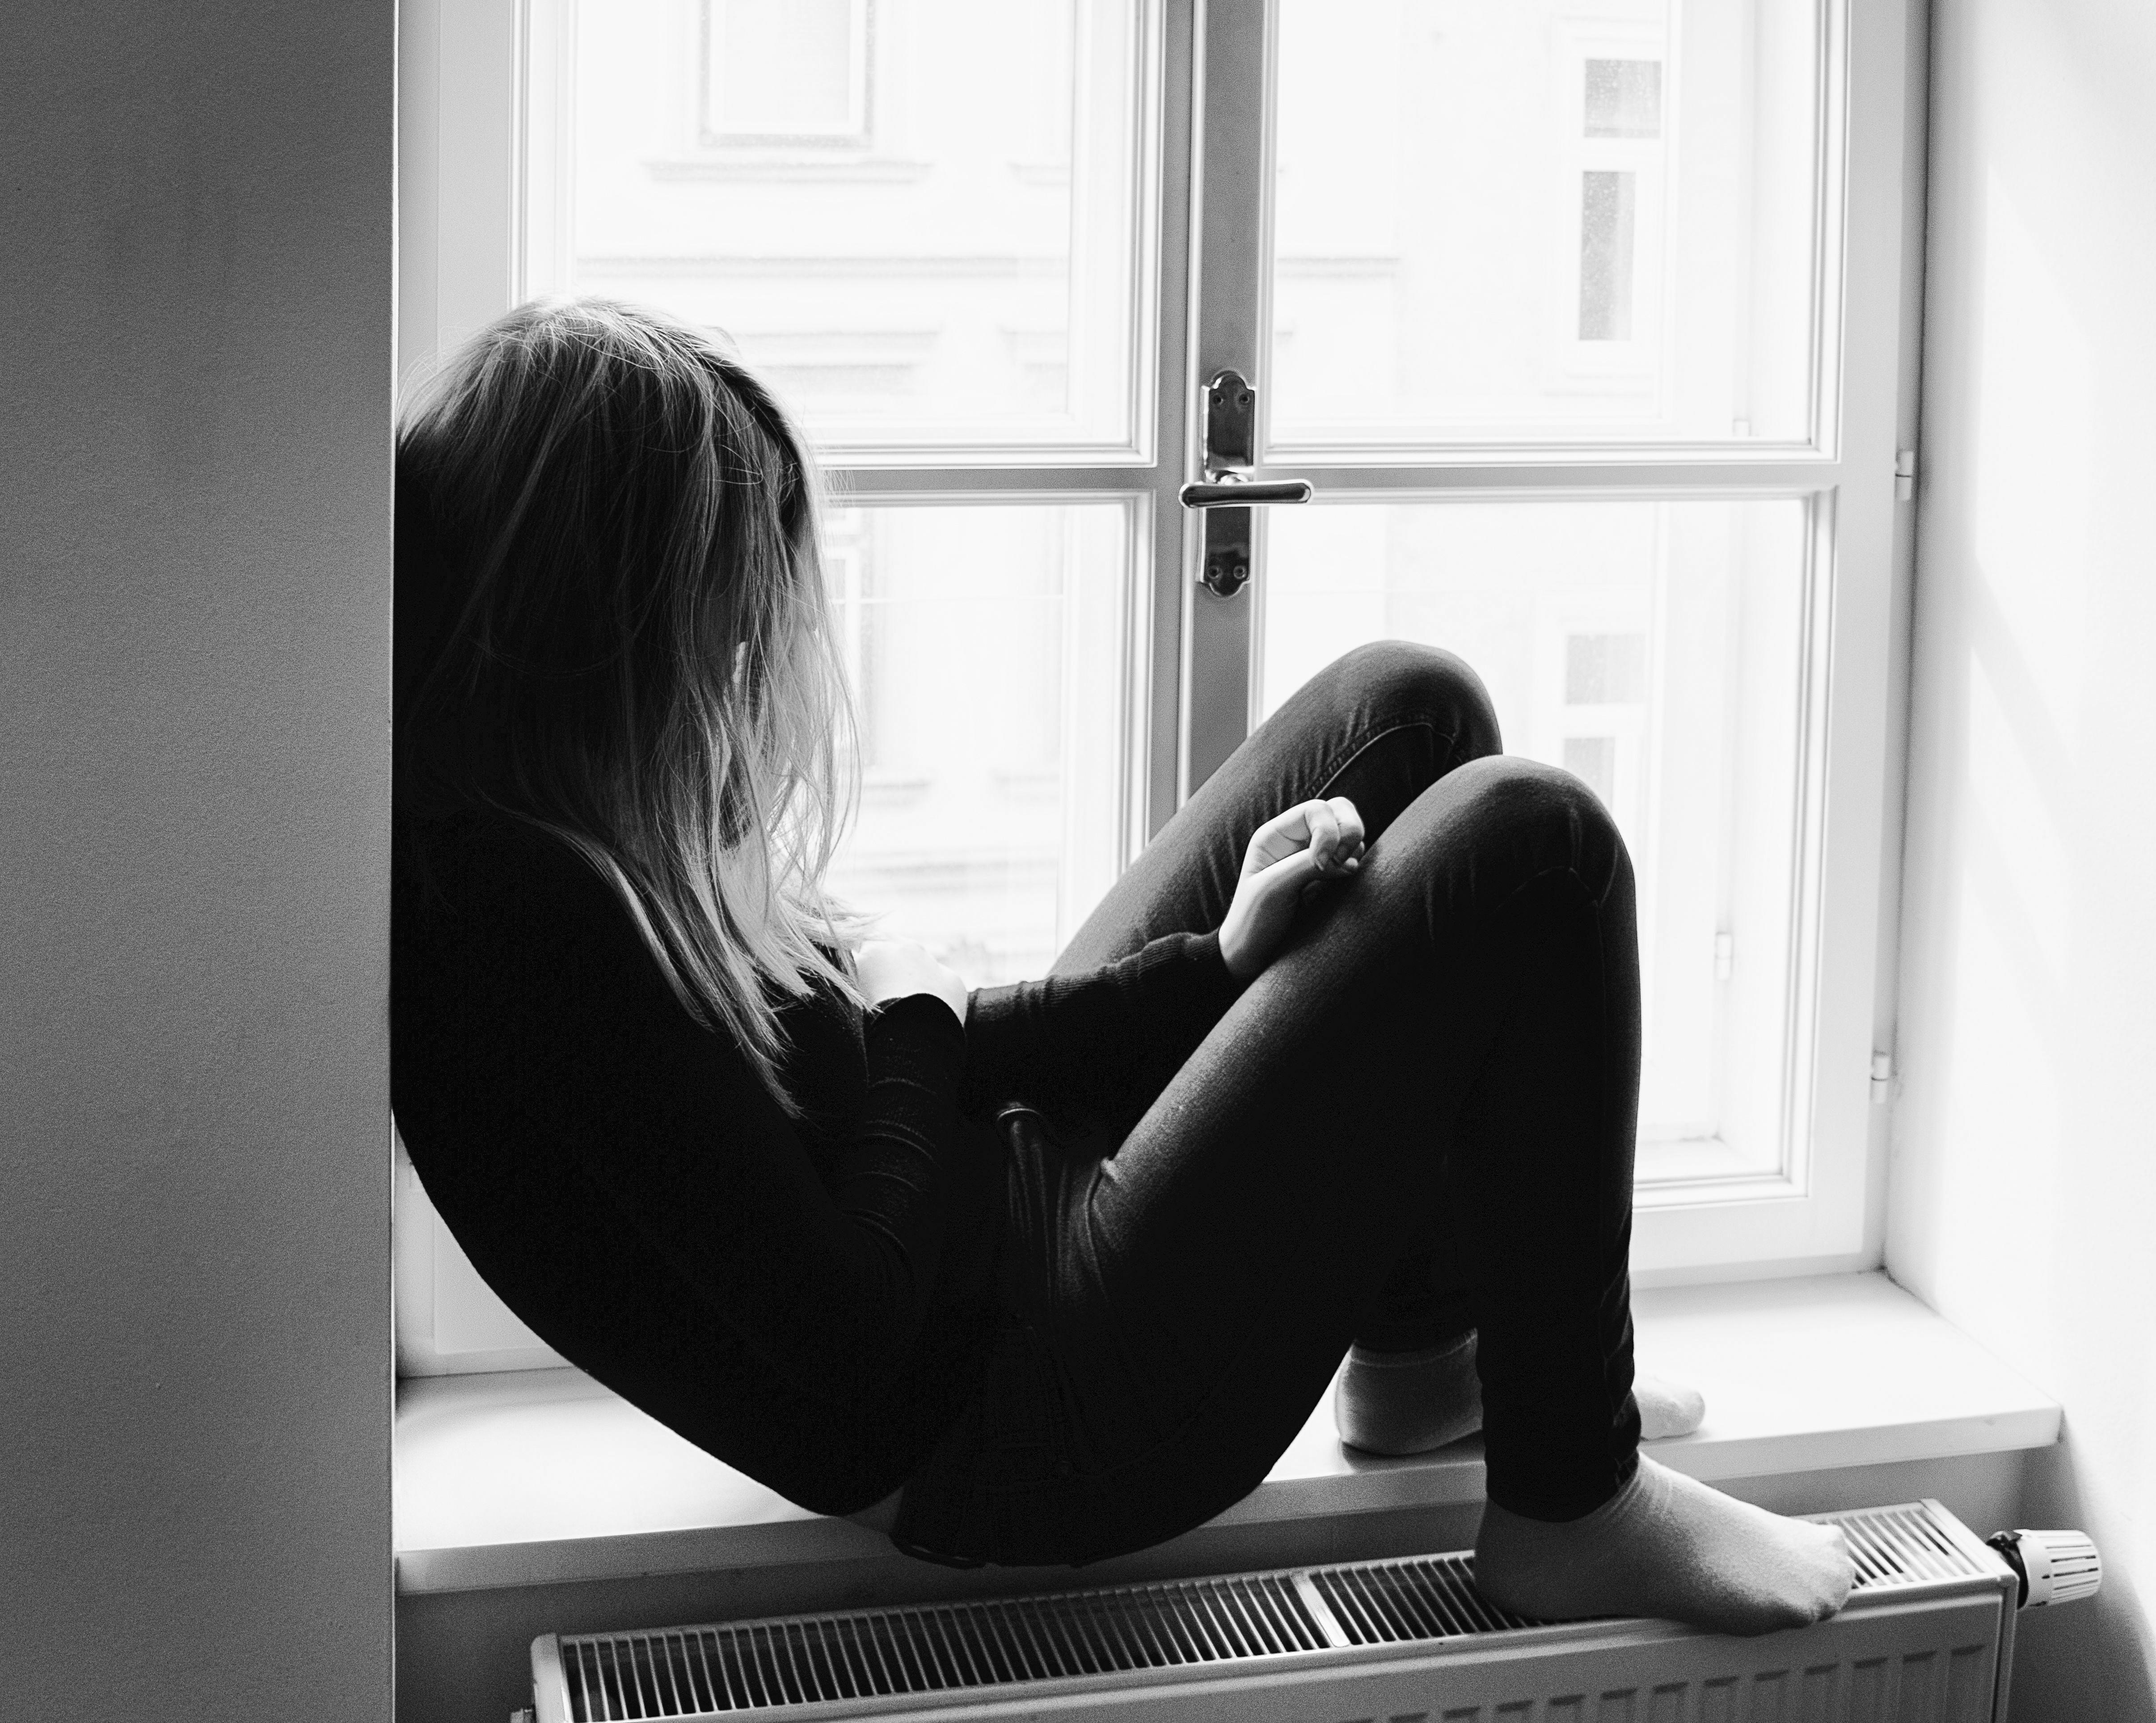 sad fenêtre, rupture